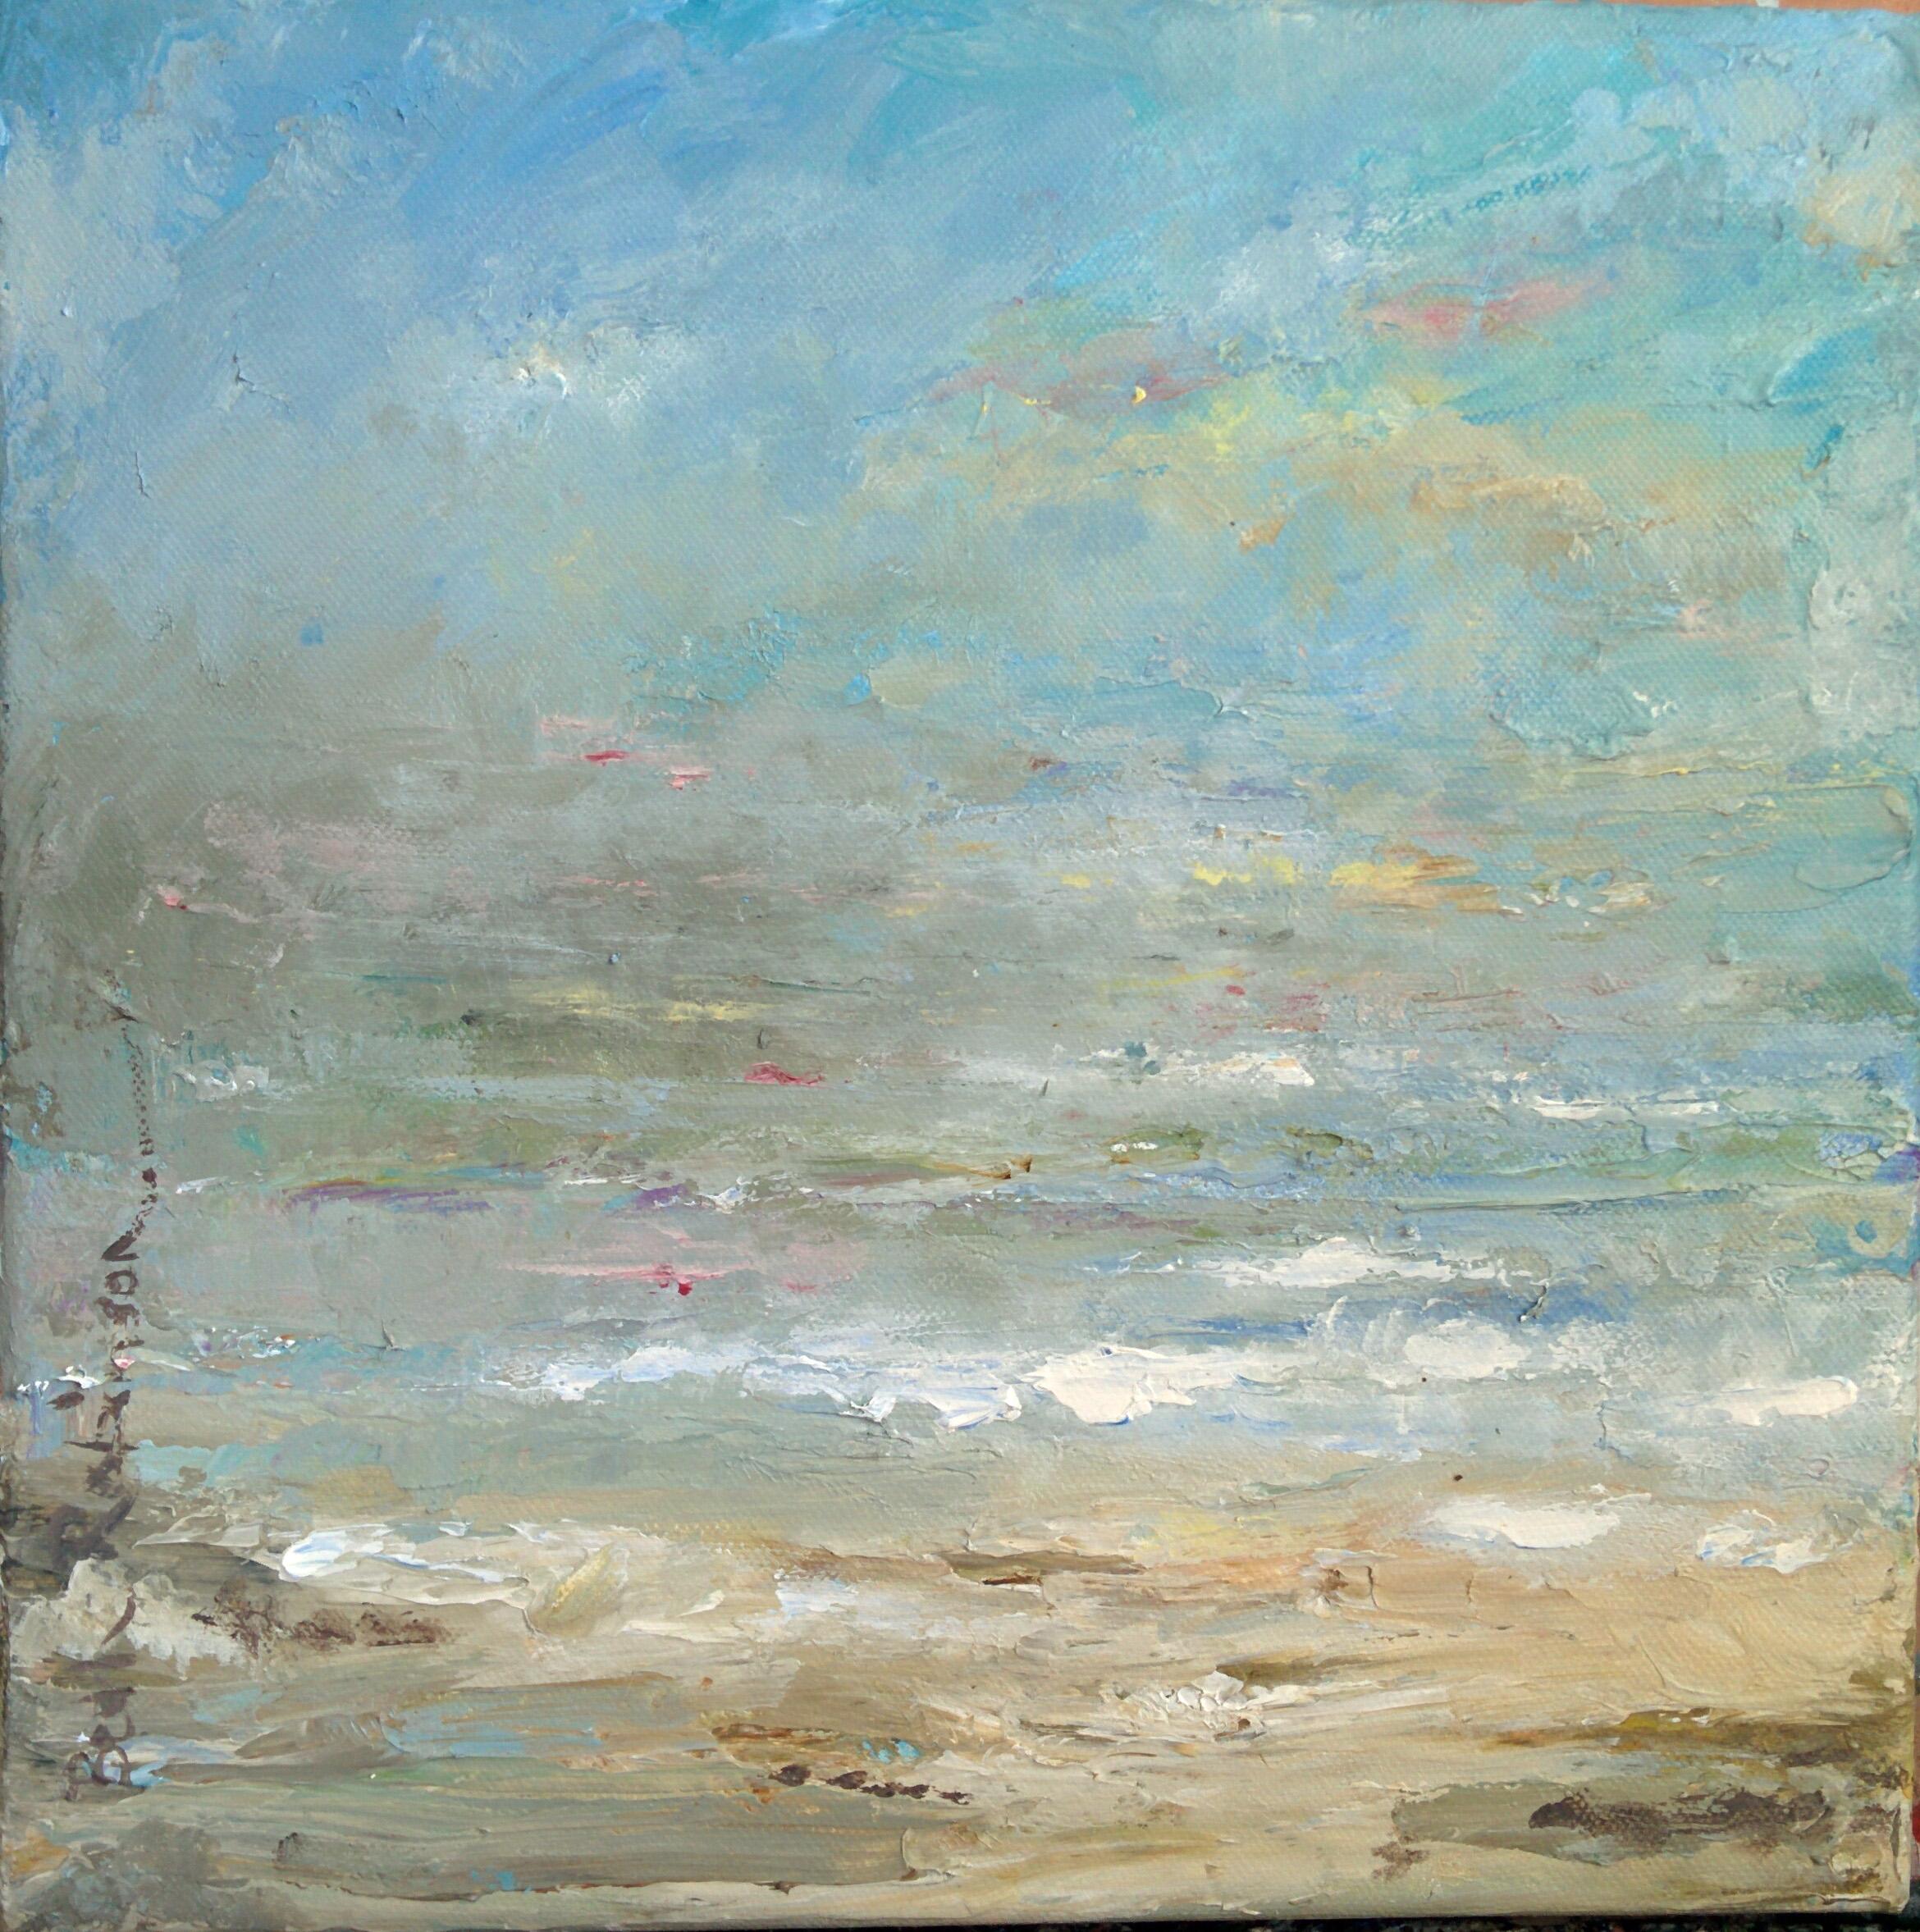 Glimmer of light acrylics on canvas unframed 30 x 30 cm £395